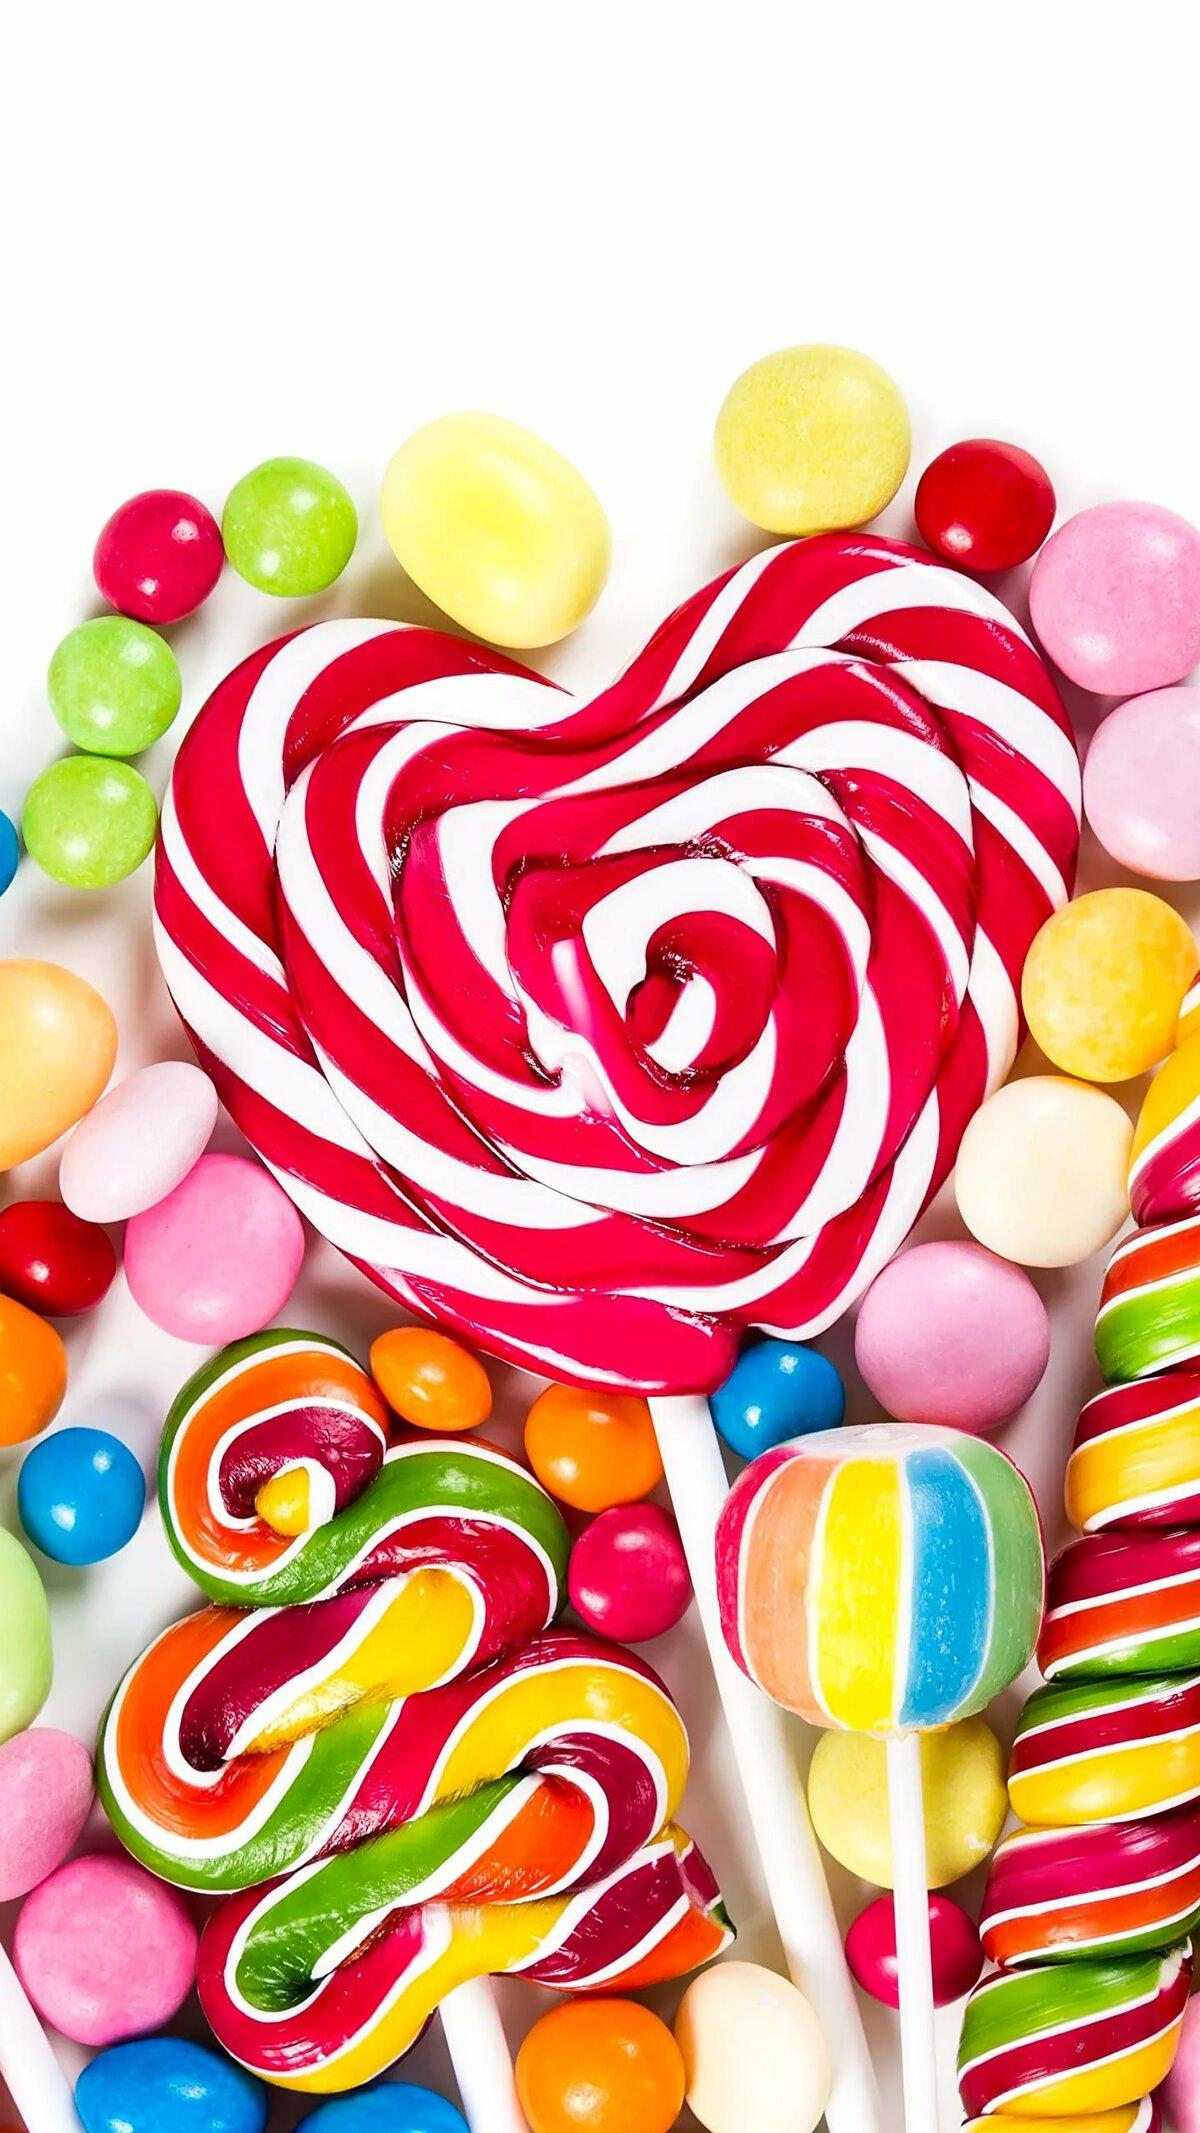 Картинка конфетки фото